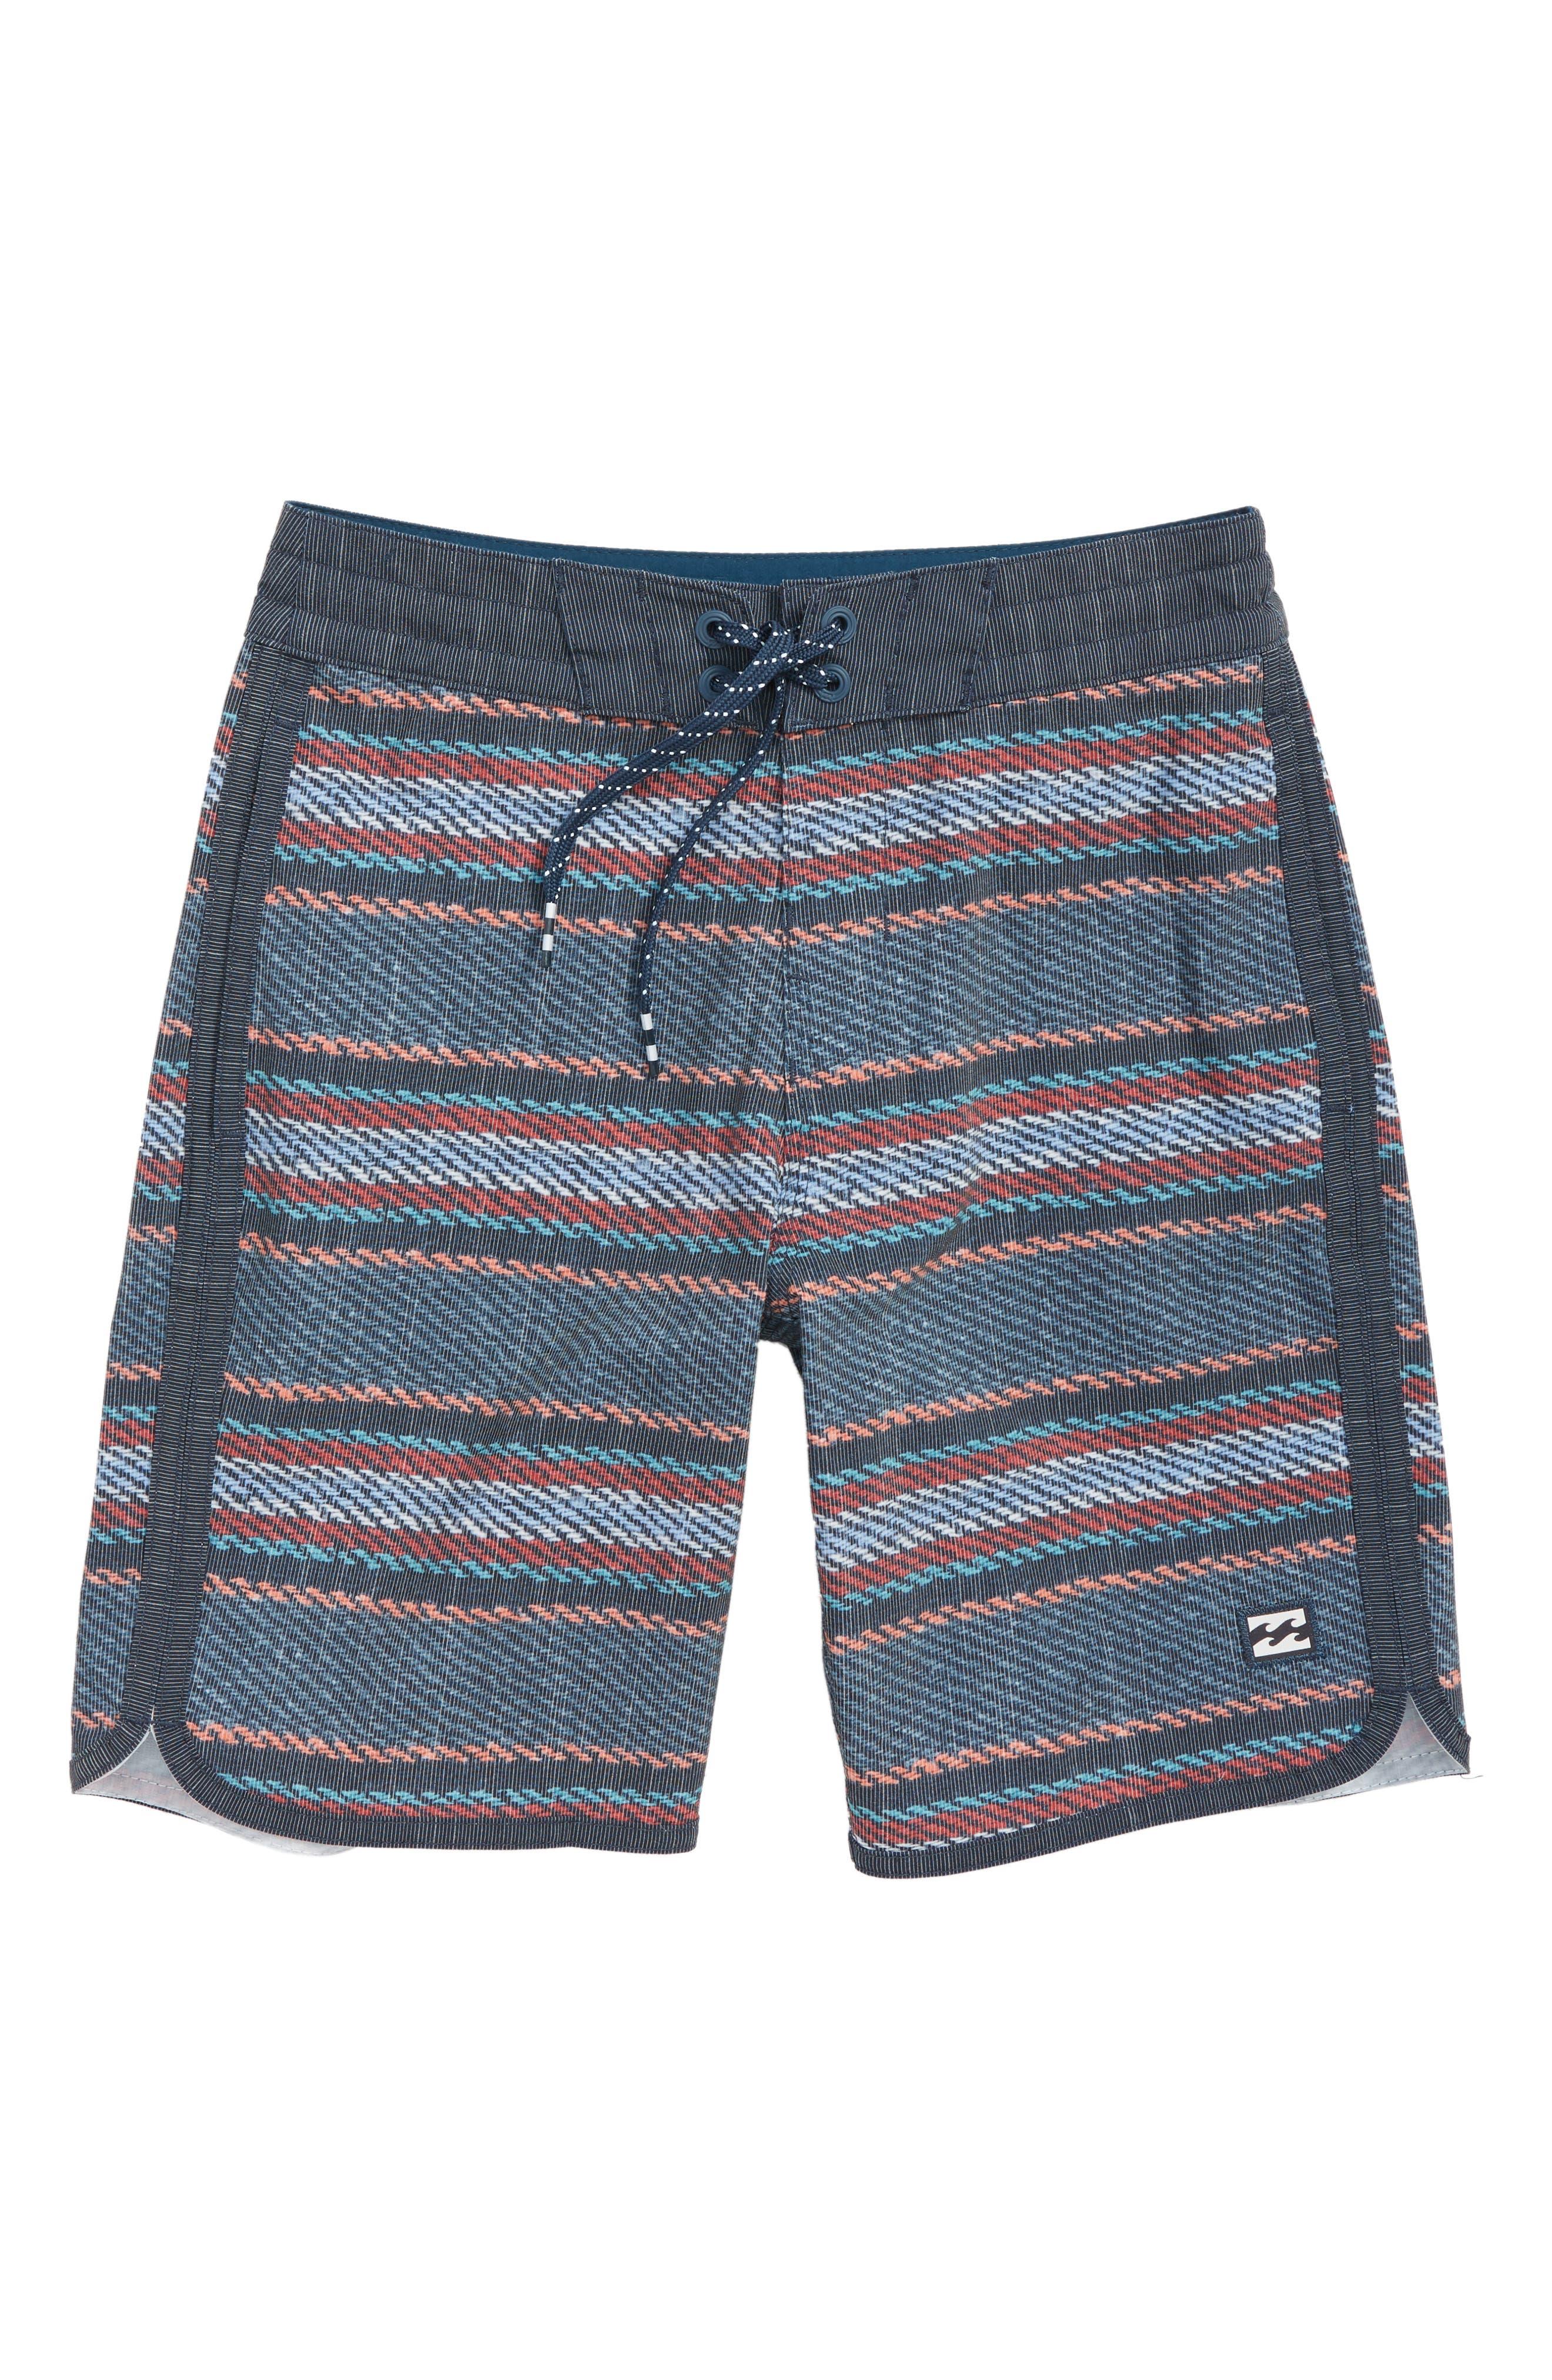 f2de5c29f5fa5 Billabong - Boys' Swimwear and Beachwear